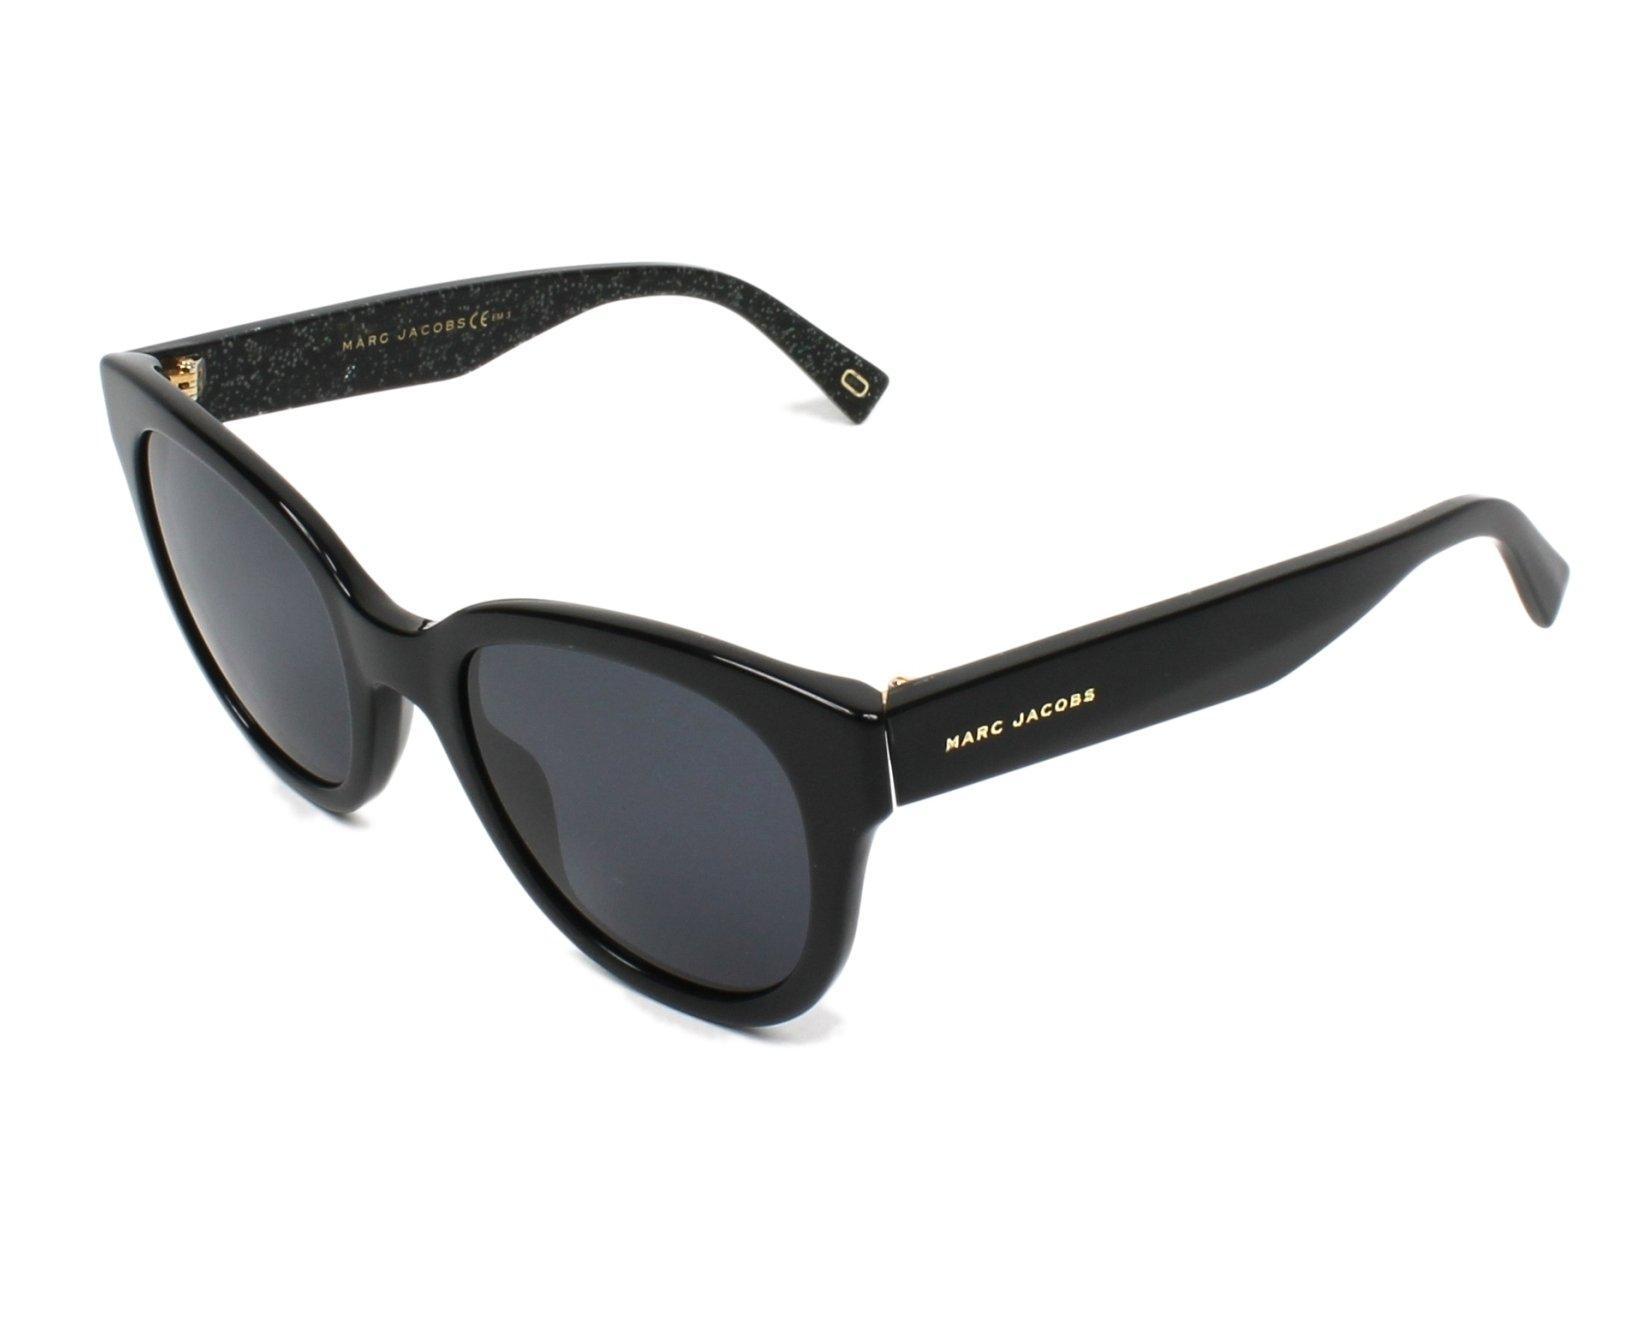 Marc Jacobs Marc231/S Sonnenbrille Schwarz Glitter NS8 50mm zePIlr ...